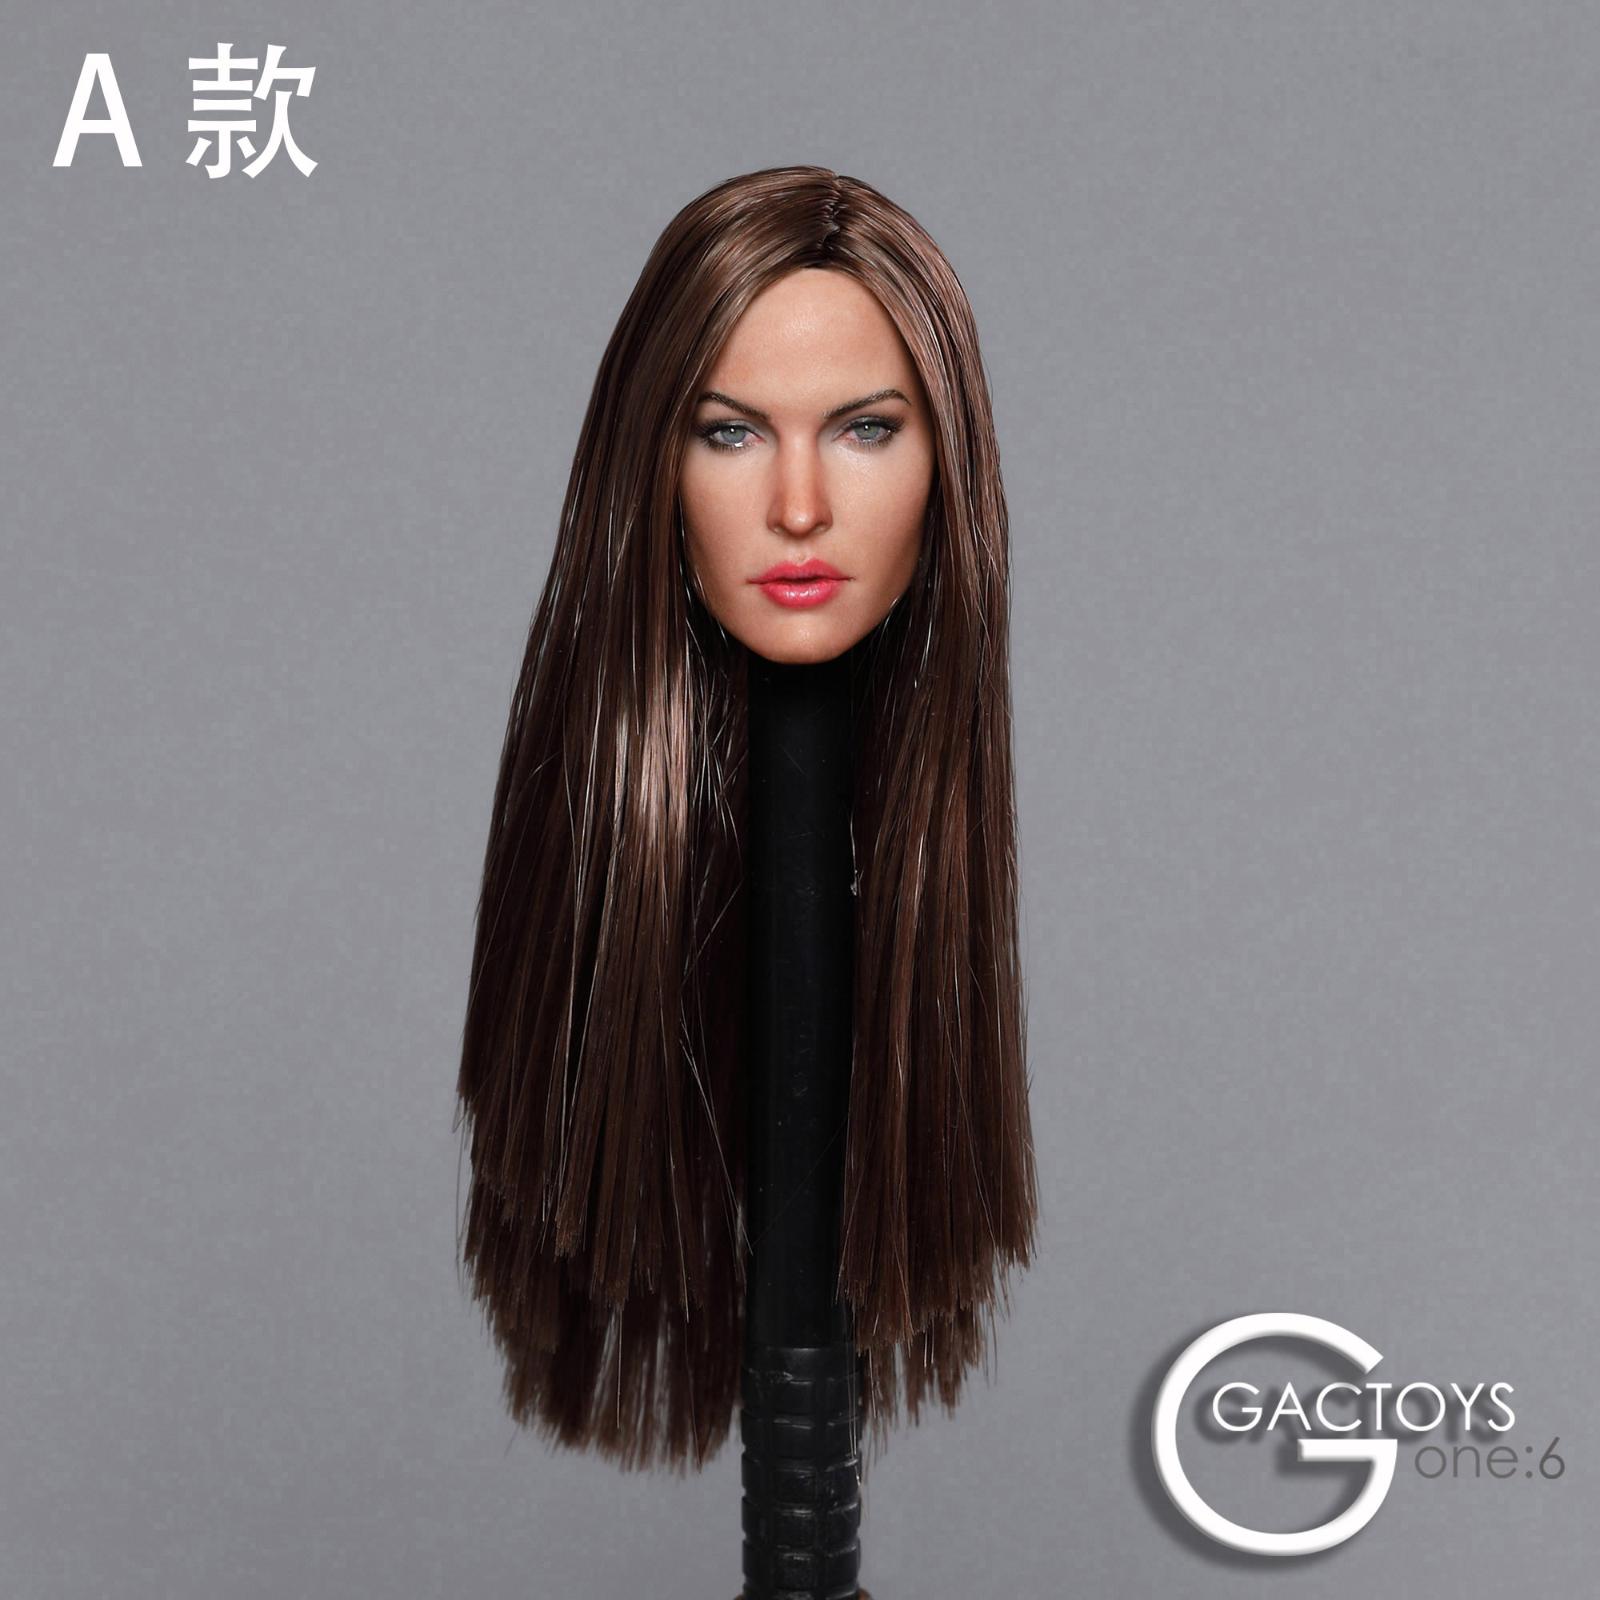 1//6 Scale GACTOYS GC021 Female Head With Seductive Expression H#Suntan